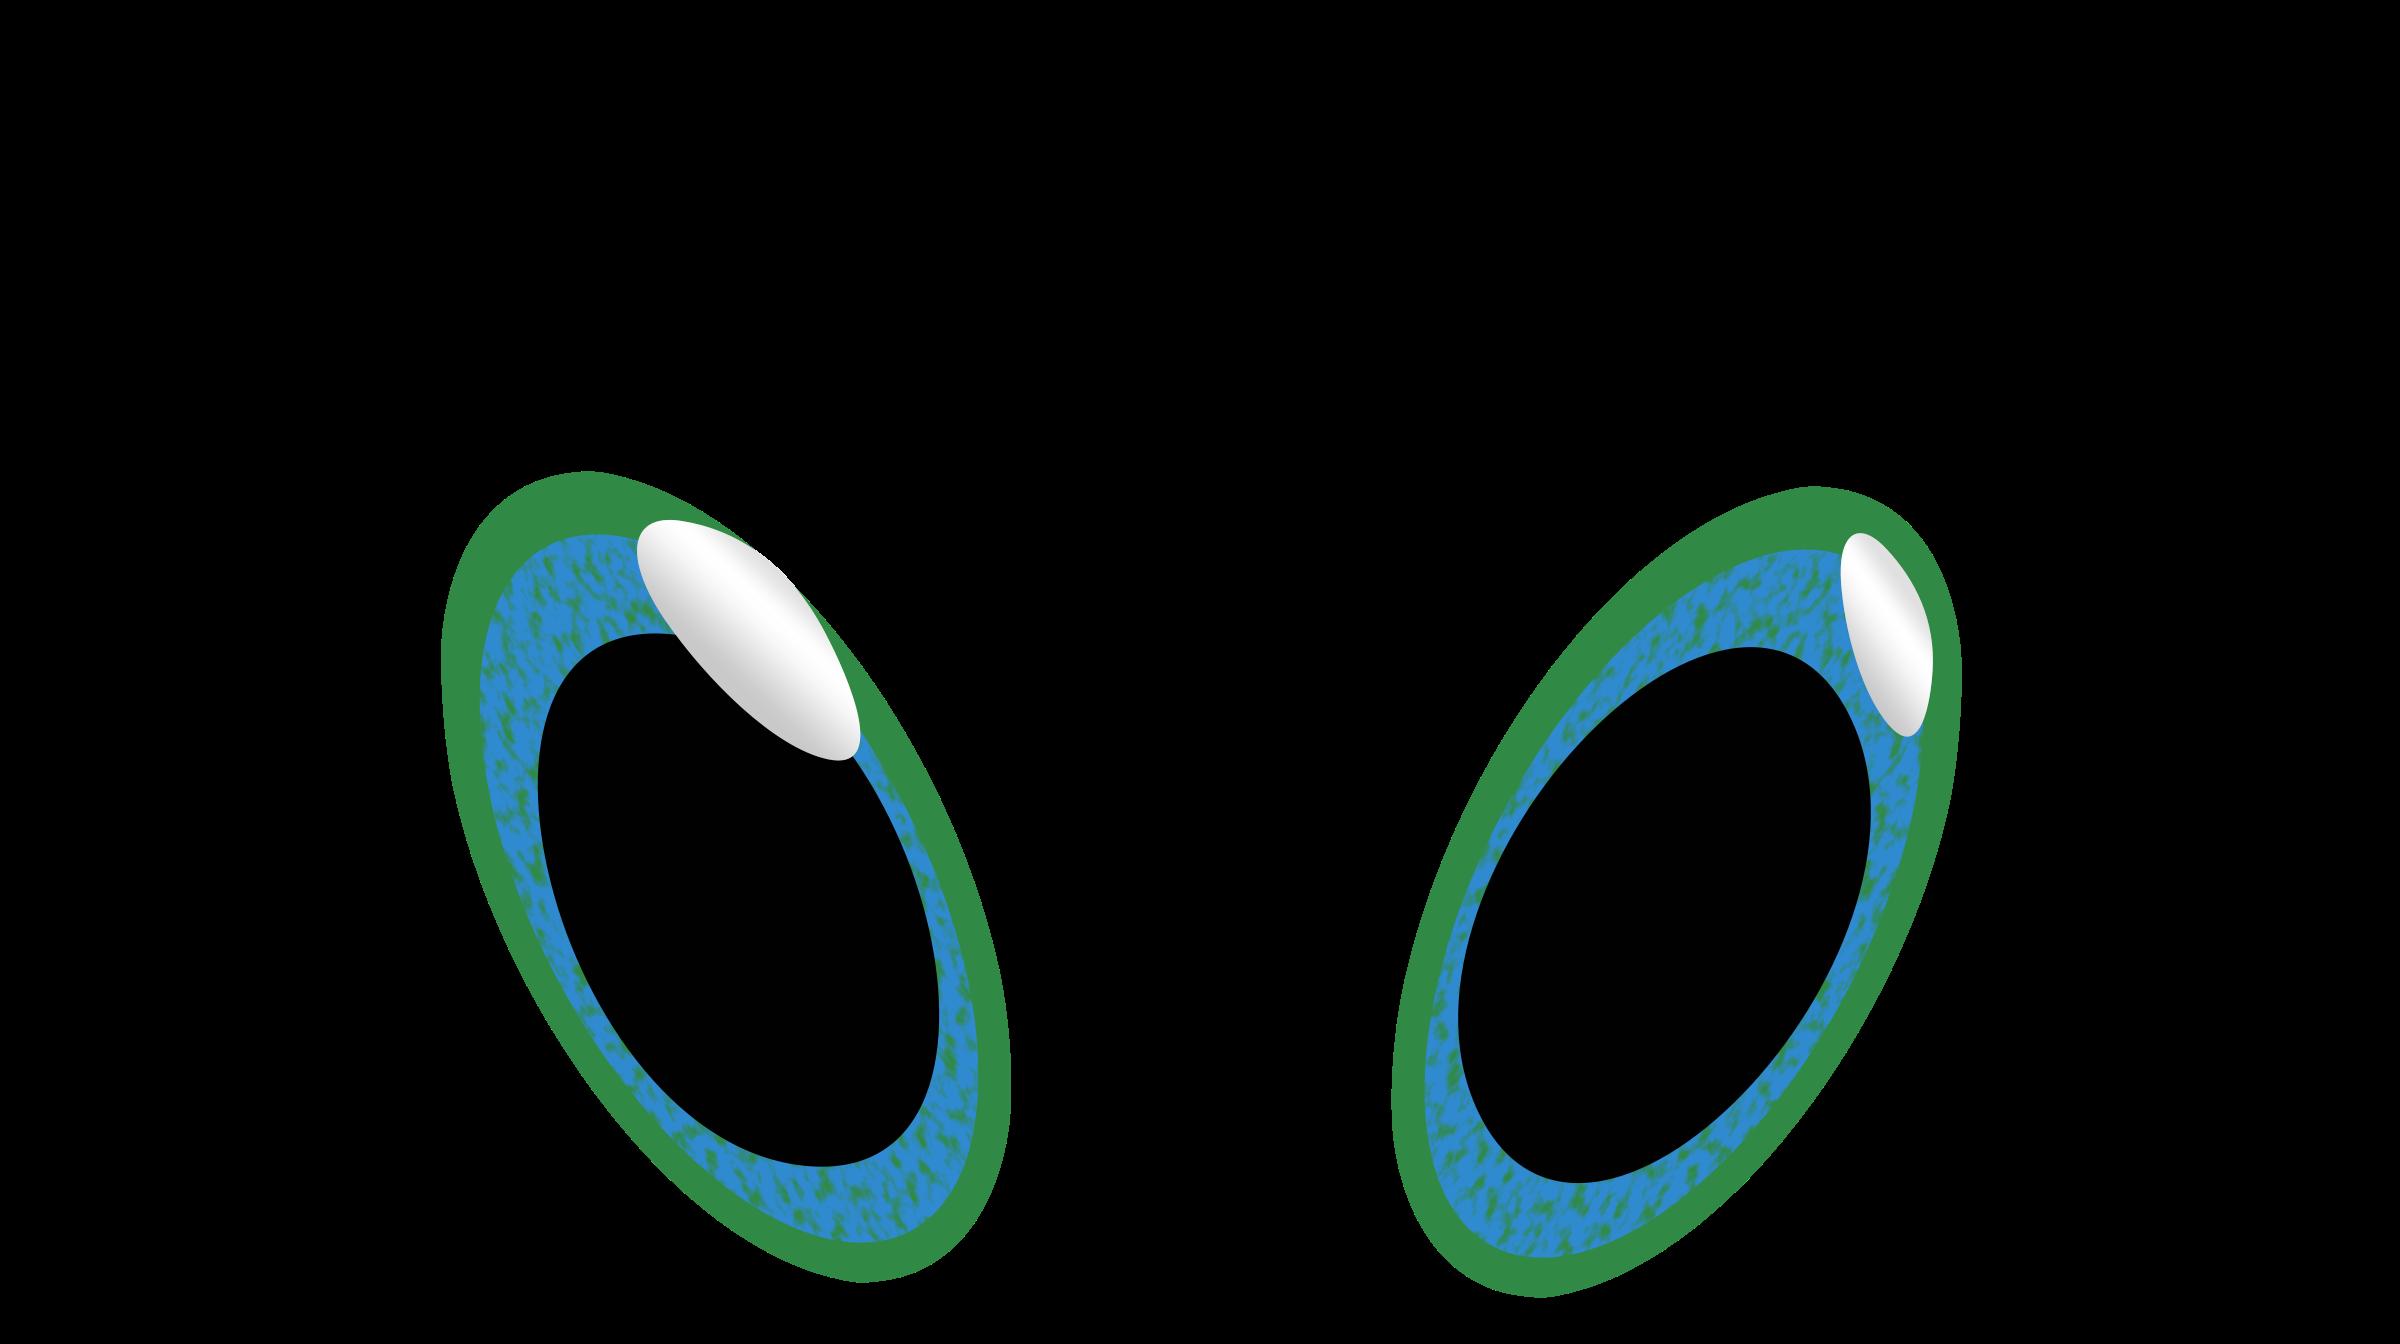 Big cartoon eyes panda. Eyeballs clipart octopus eye